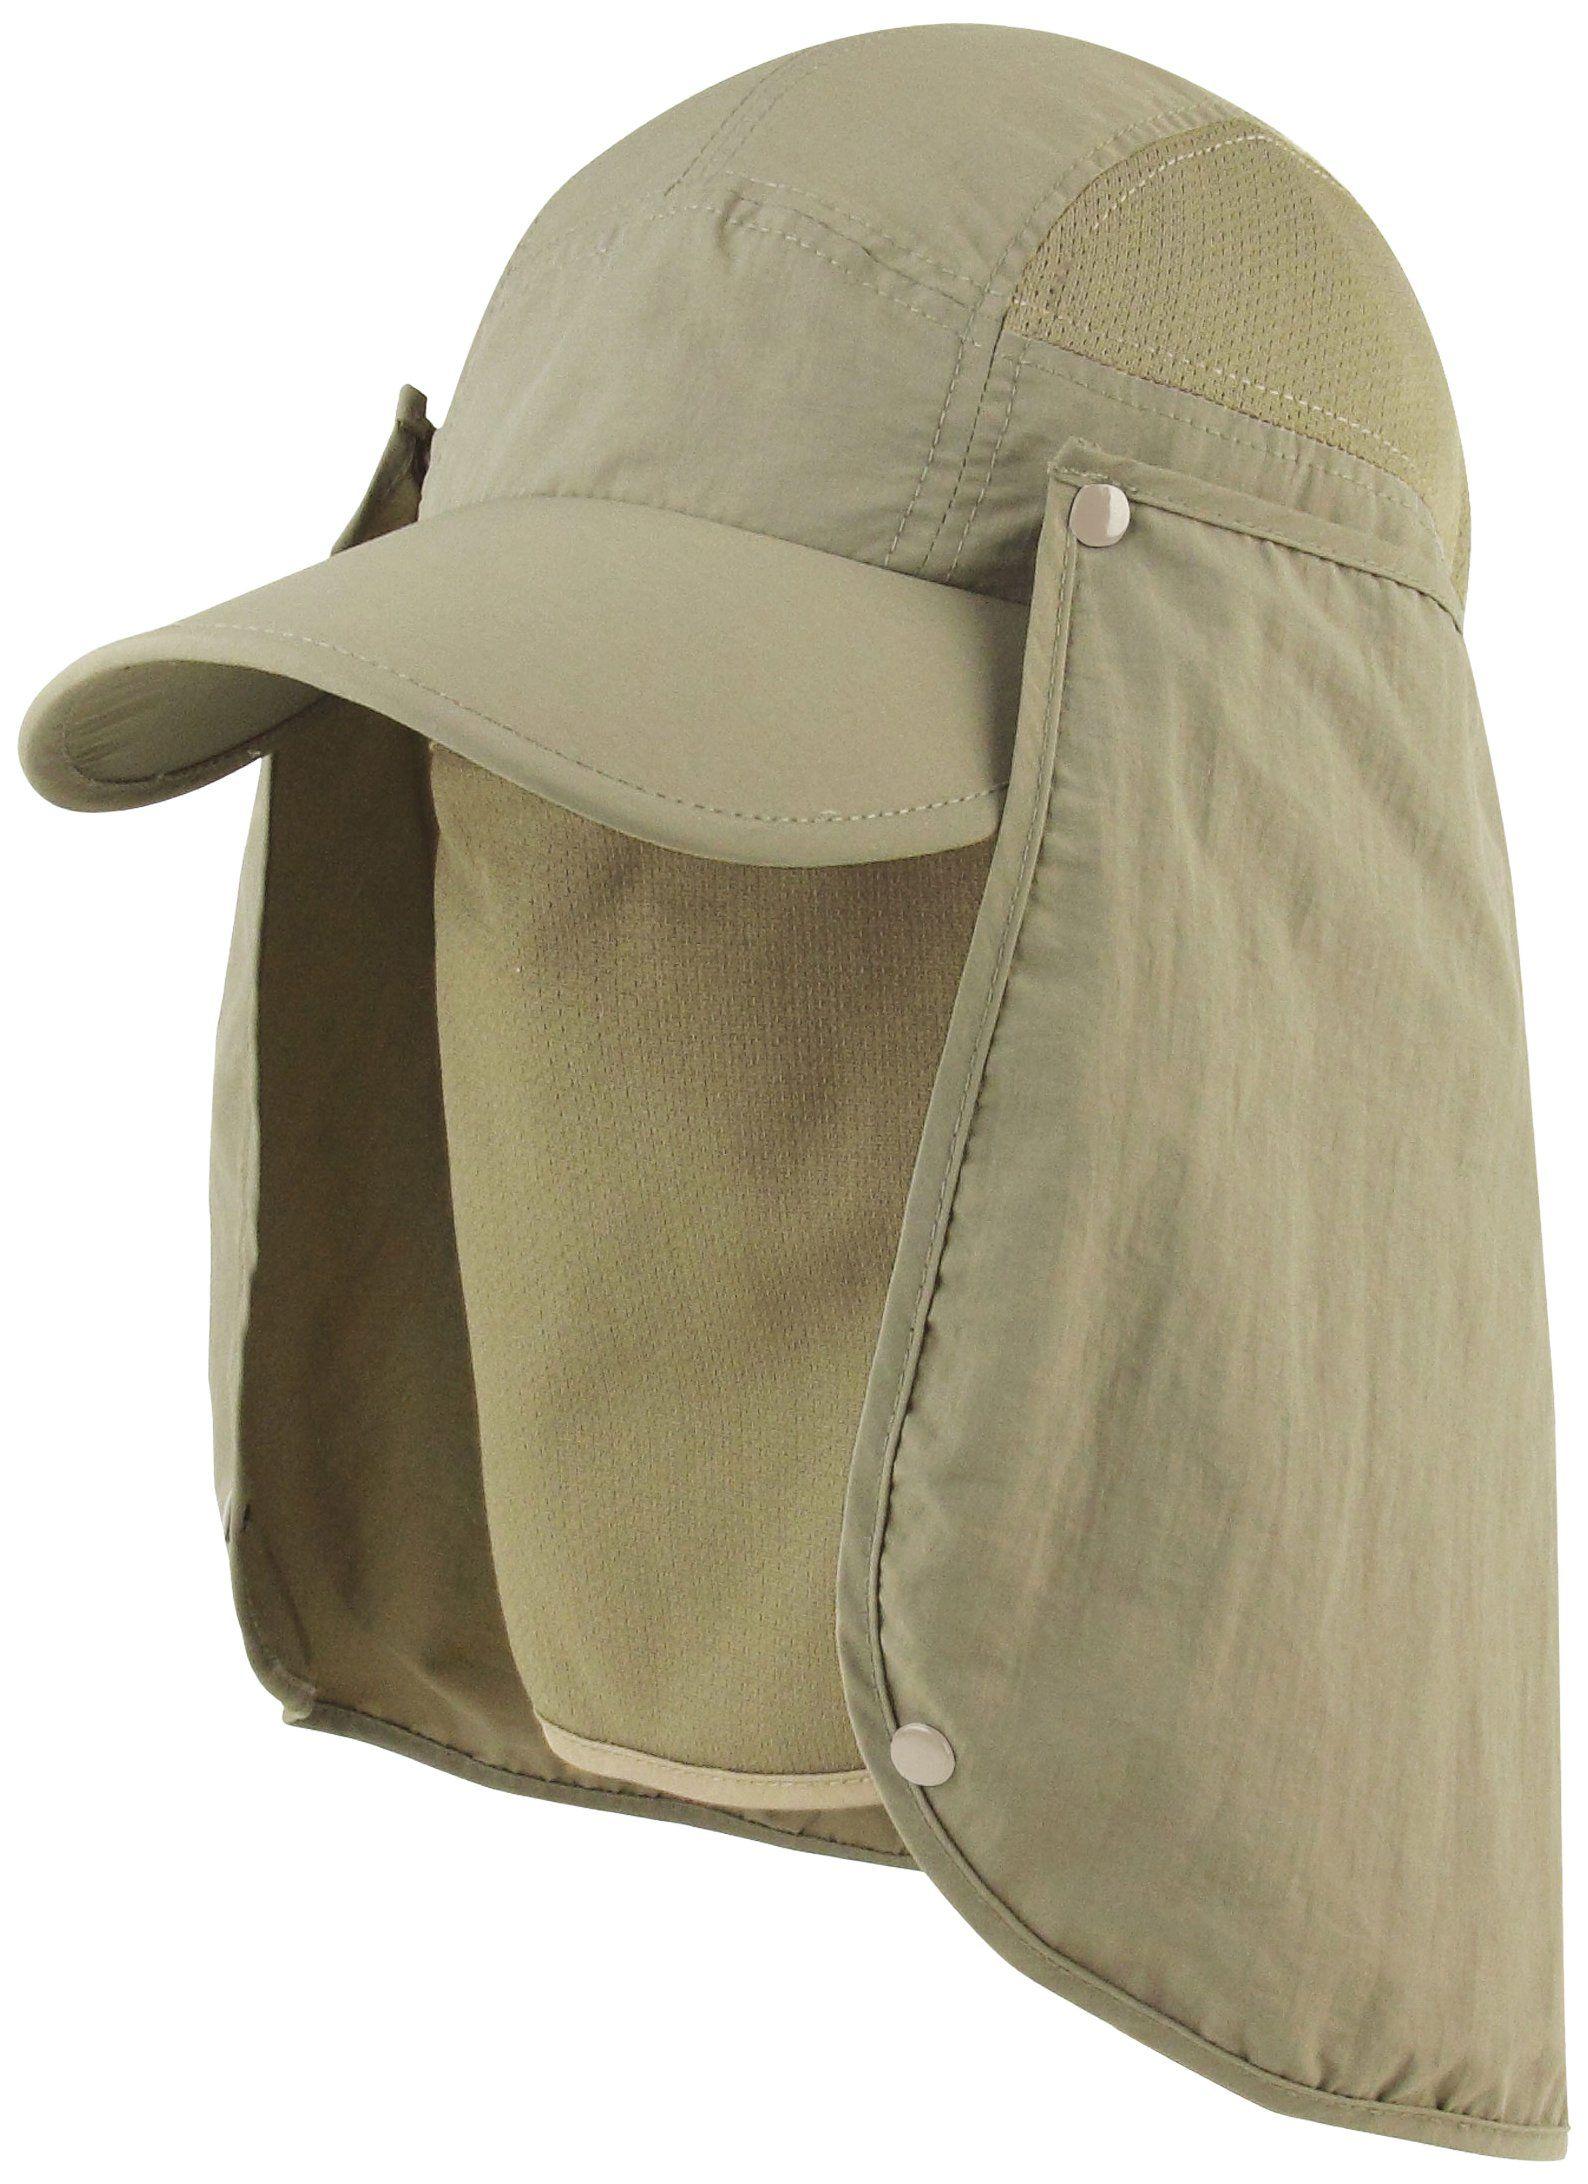 Juniper Taslon Uv Cap Large Bill Cap One Size Khaki Detachable Face Cover W Nose Insert Back Flap Uv Protection Wat Cap Mens Sun Hats Sun Hats